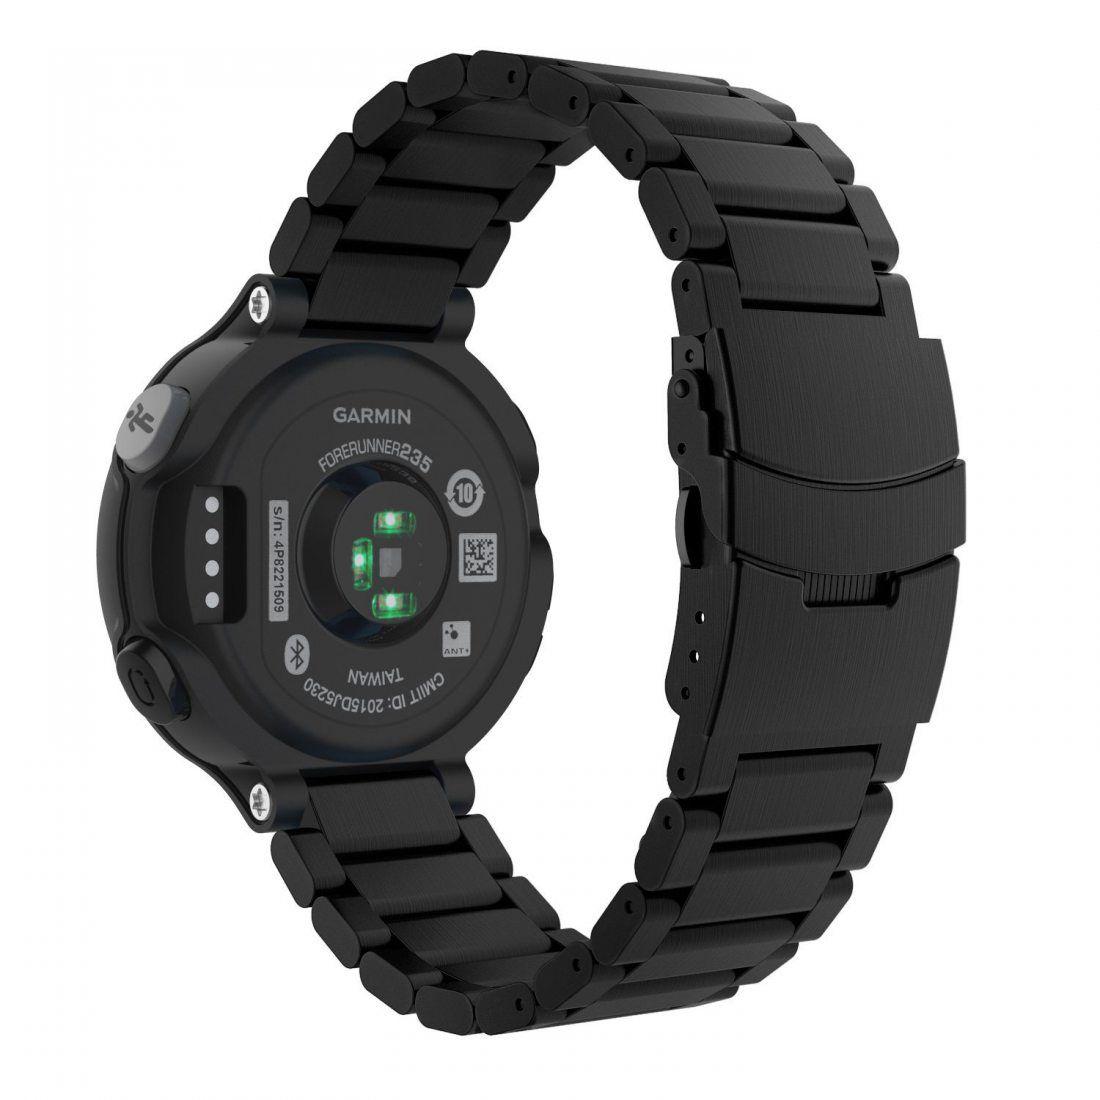 Garmin Forerunner 235 Smartwatch Bracelet, MoKo Band en acier inoxydable avec Métal Fermoir déployante pour Forerunner 23522